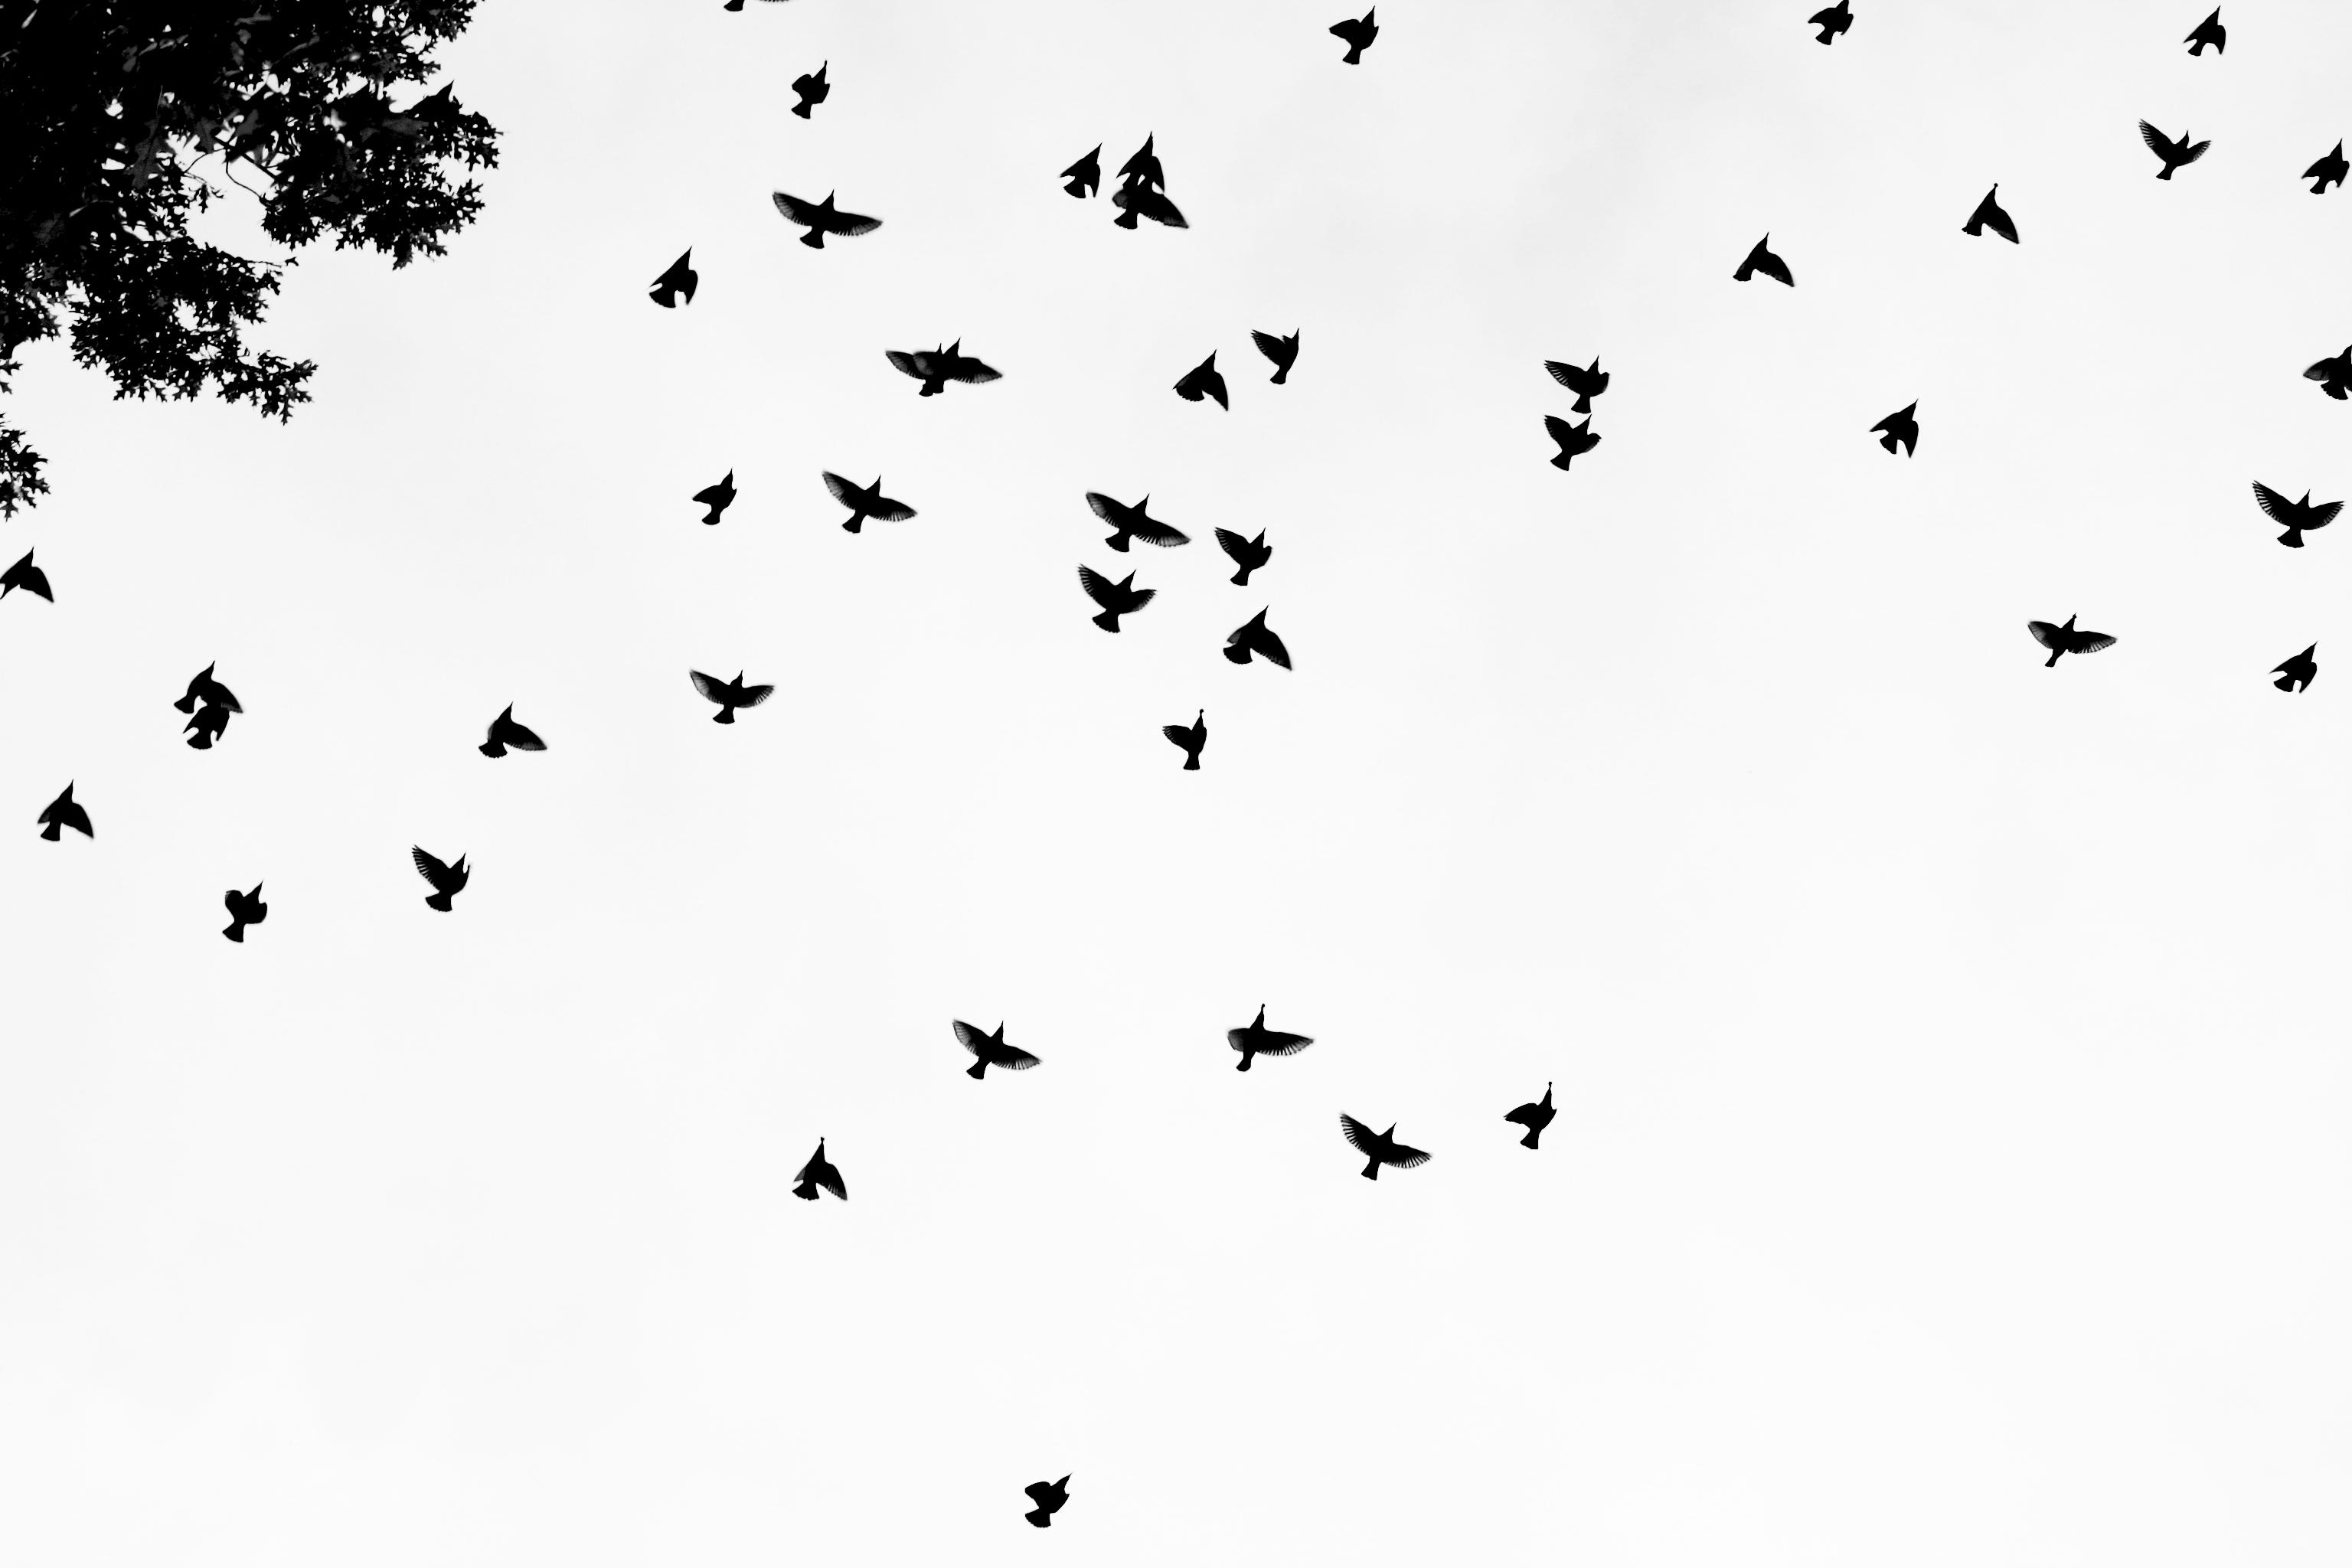 Flock Of Birds Sky Bokeh 13jpg Wallpaper 3072x2048 219274